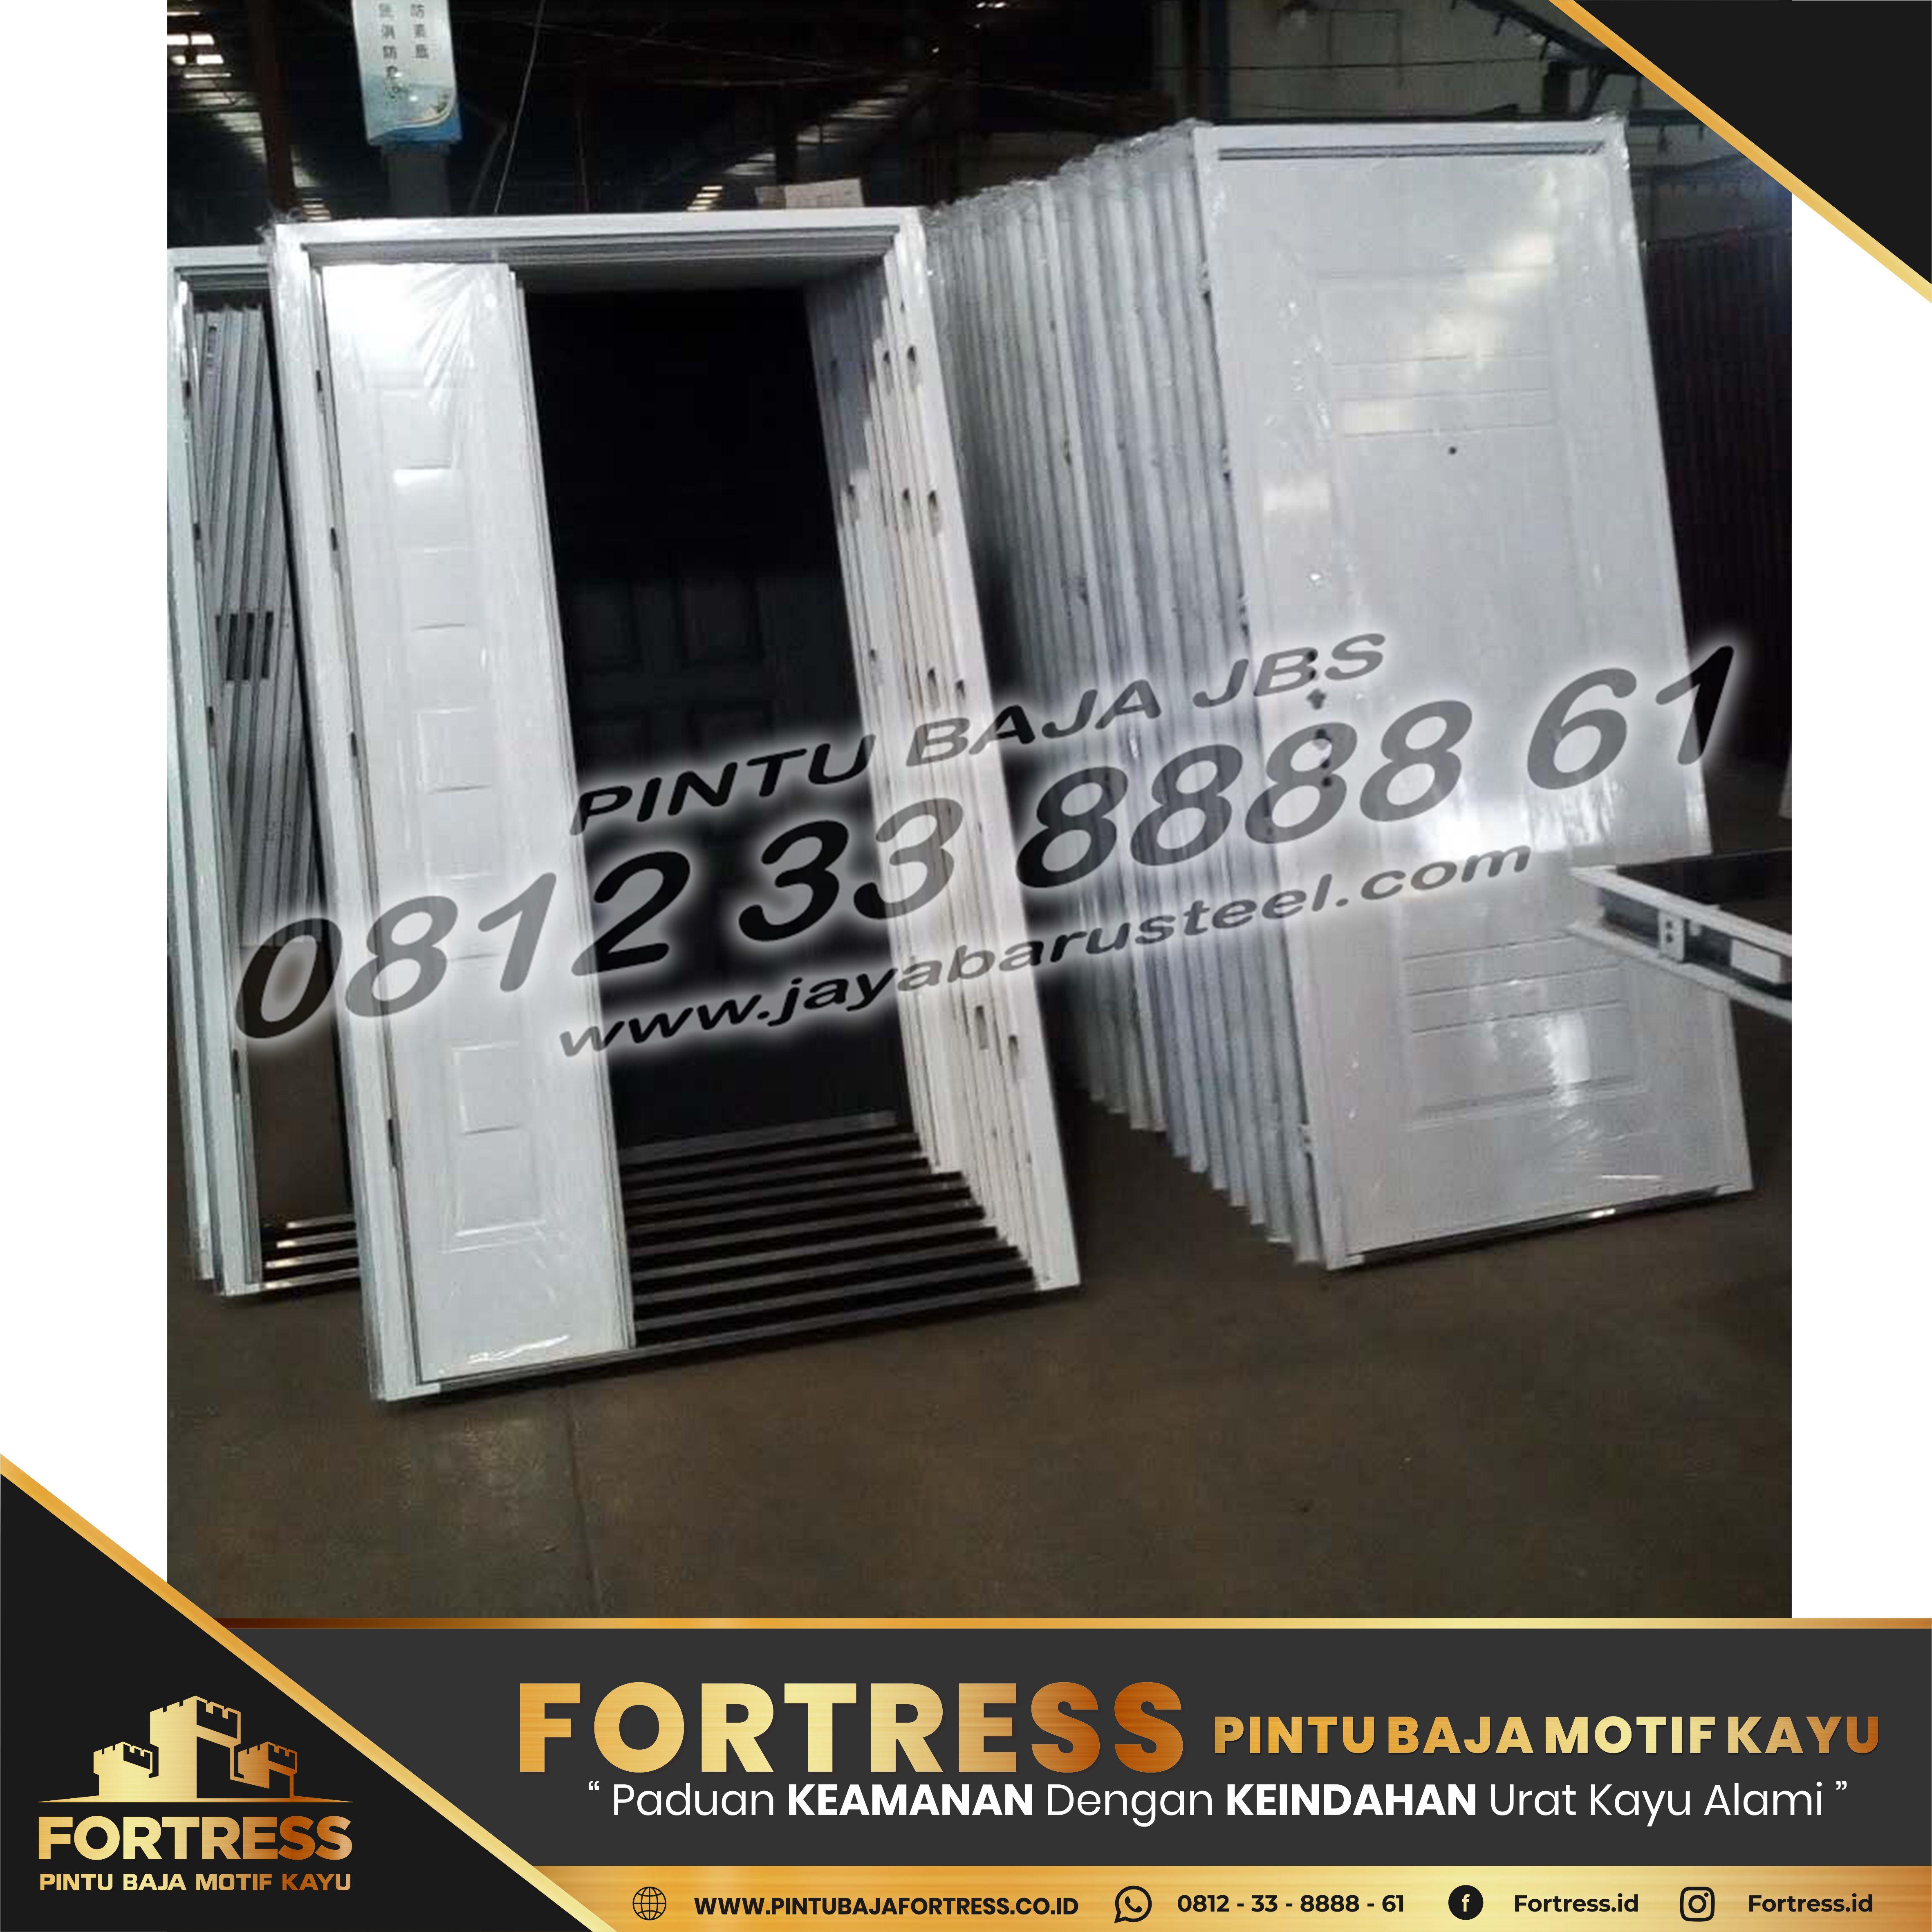 0812-91-6261-07 (FORTRESS) Lack of Steel Doors CrossRay …